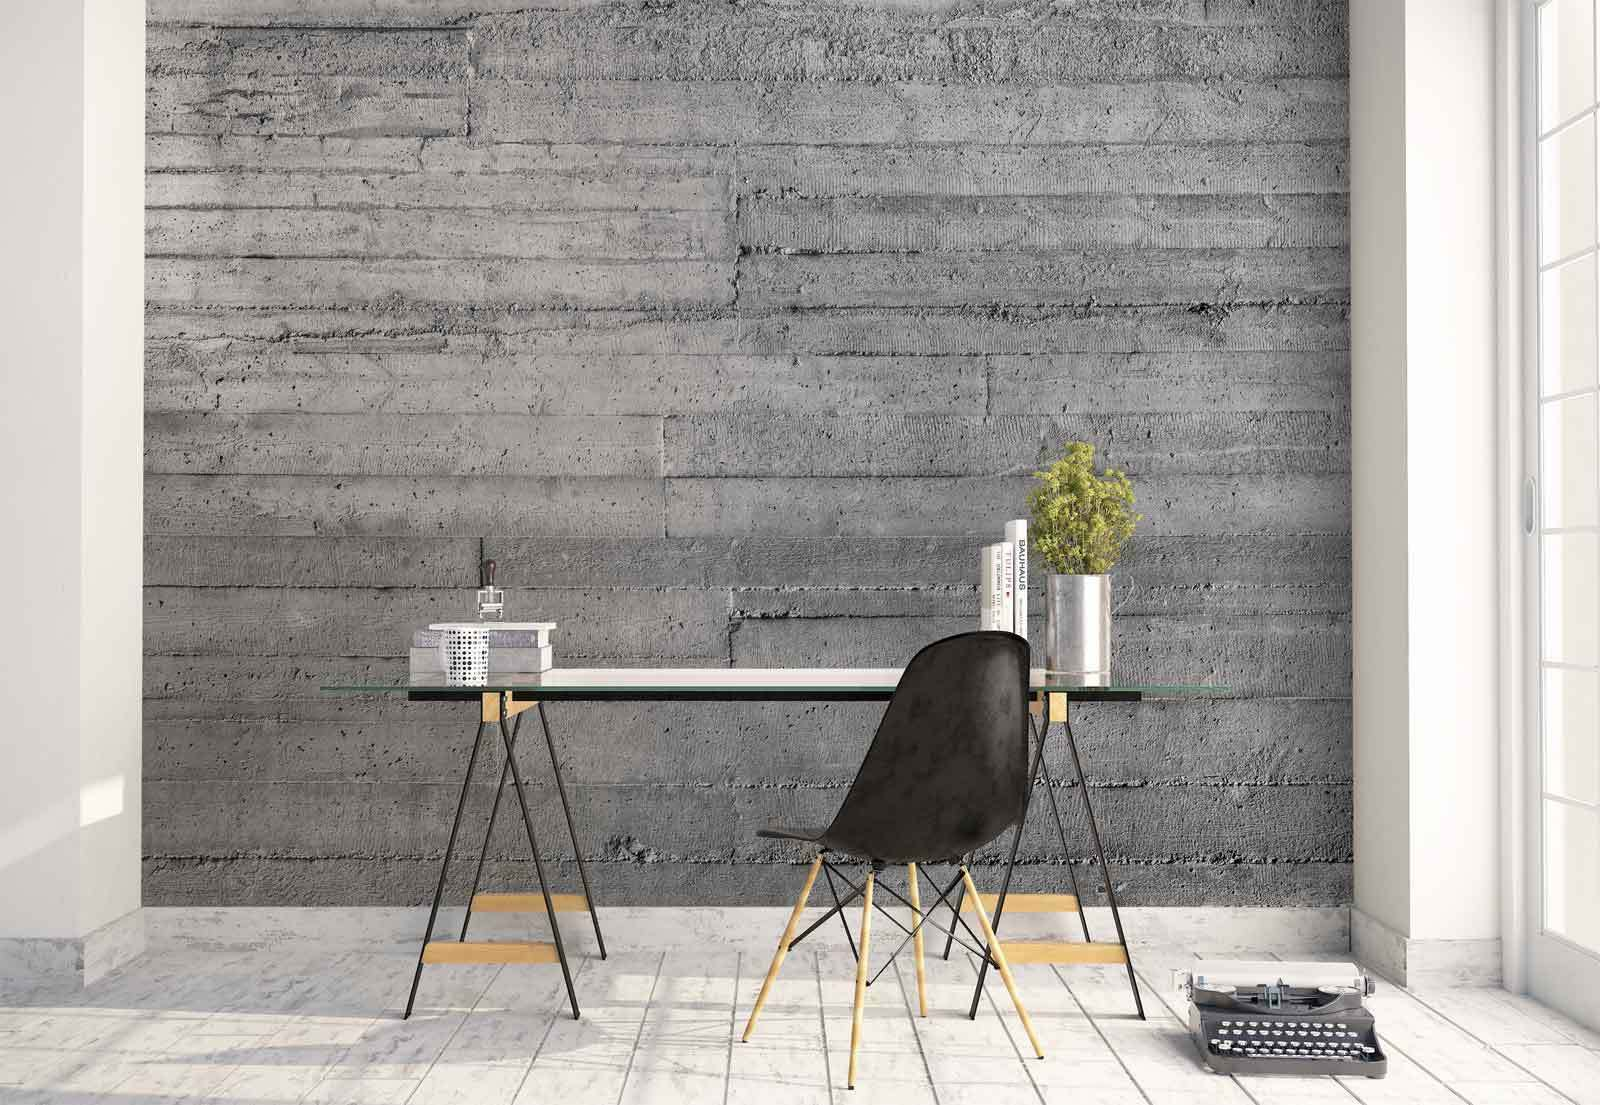 Concrete wall Texture Grunge  Photo Wallpaper Wall Mural (FW-1157)